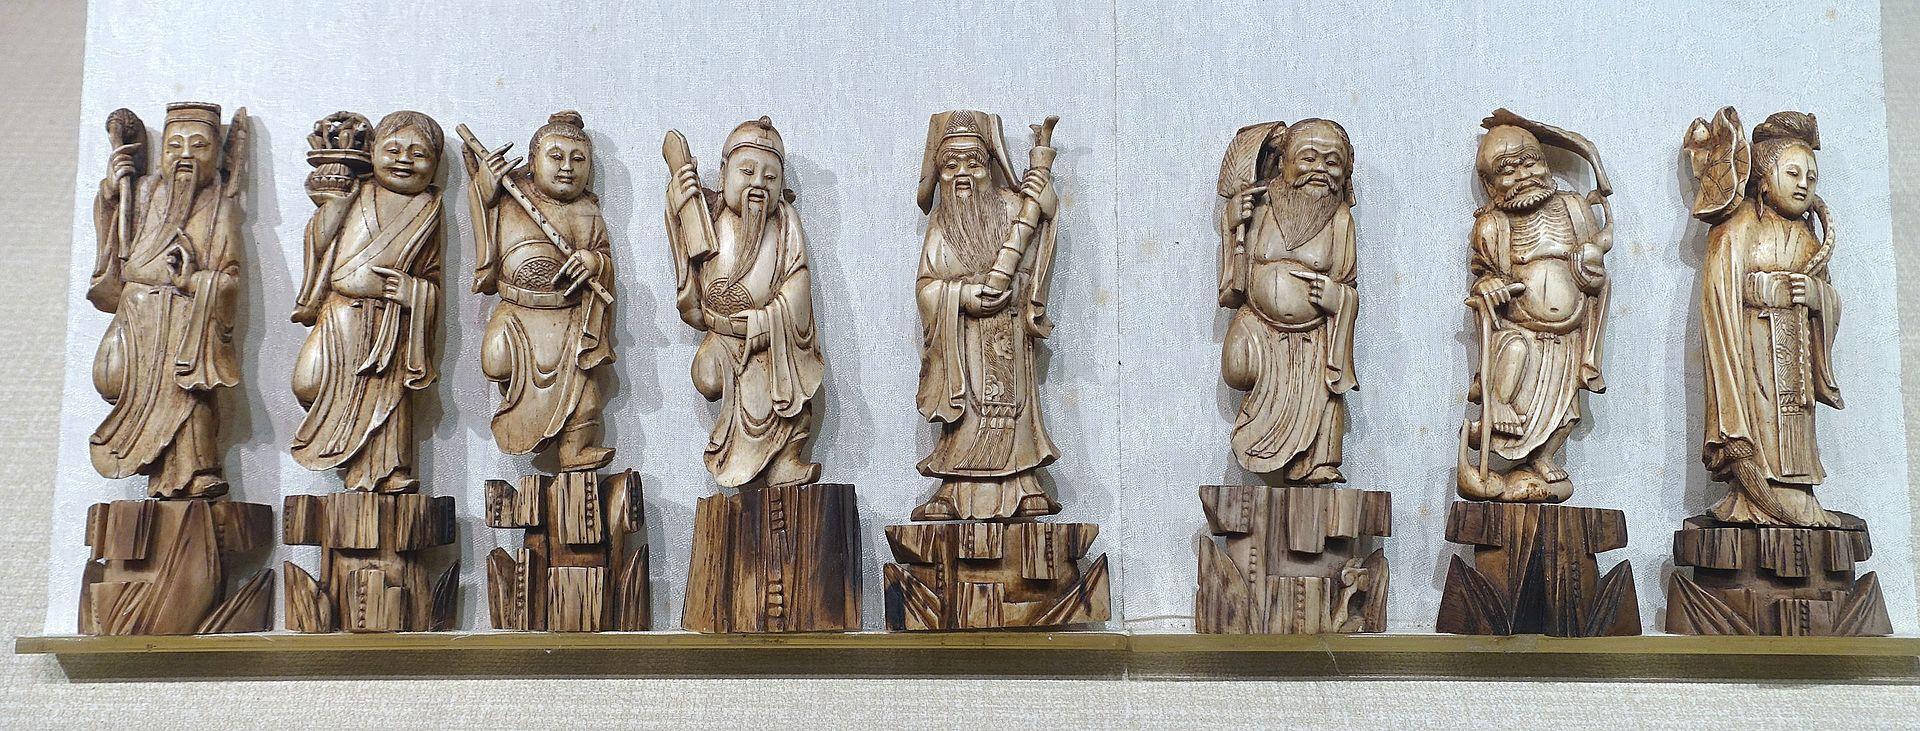 Eight Immortals, figurines - Sichuan University Museum - Chengdu, China - DSC06171.jpg